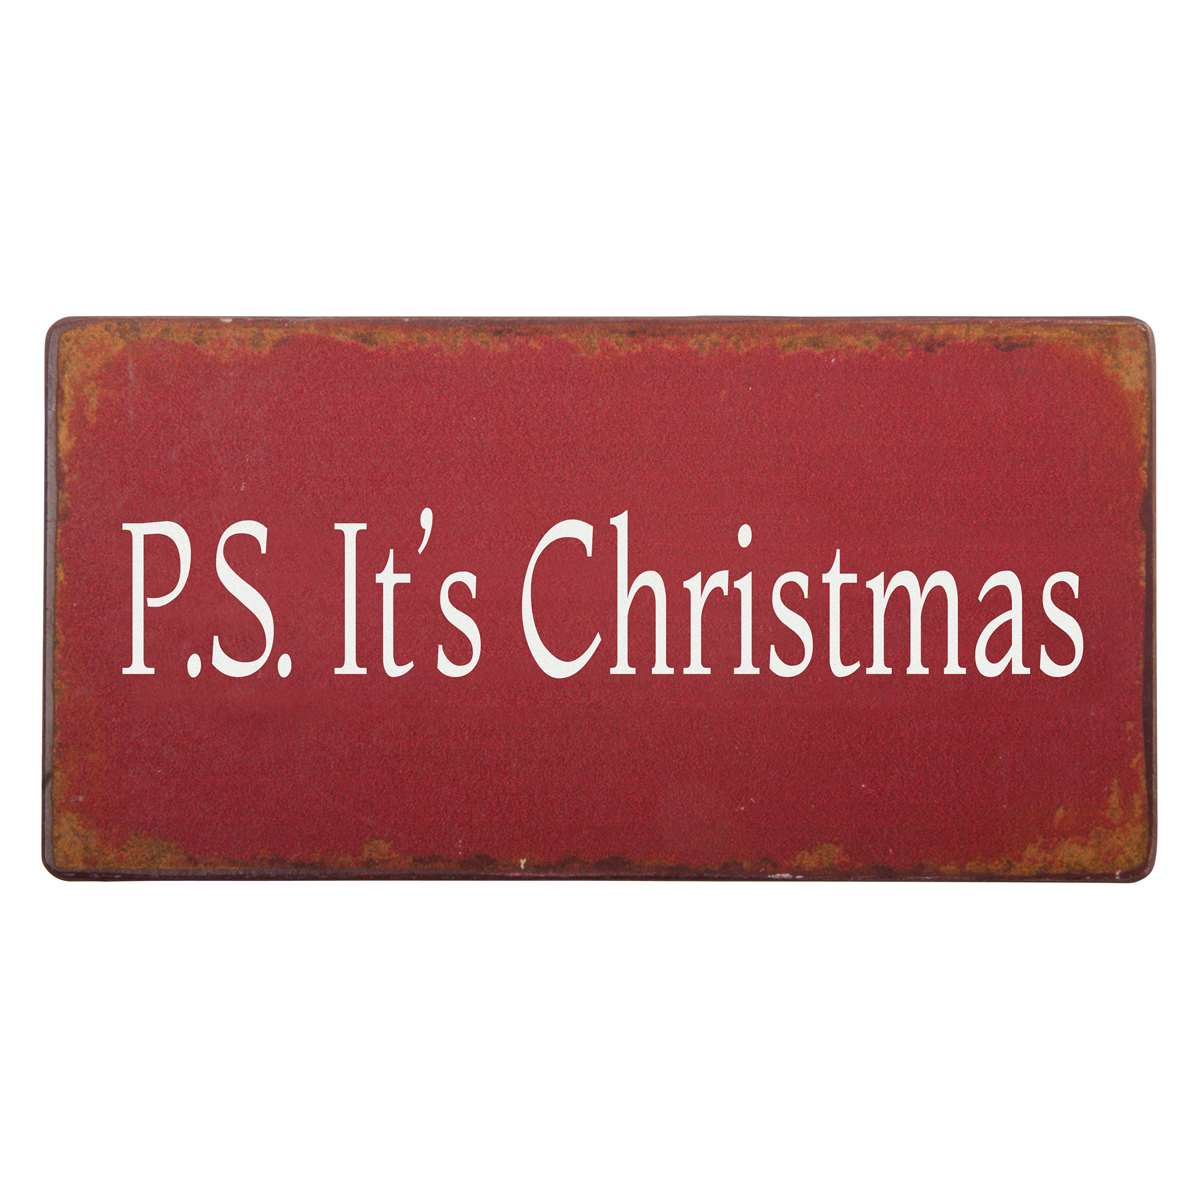 Witzigschilder - Magnet P.S. Its Christmas Ib Laursen Aps - Onlineshop Tante Emmer